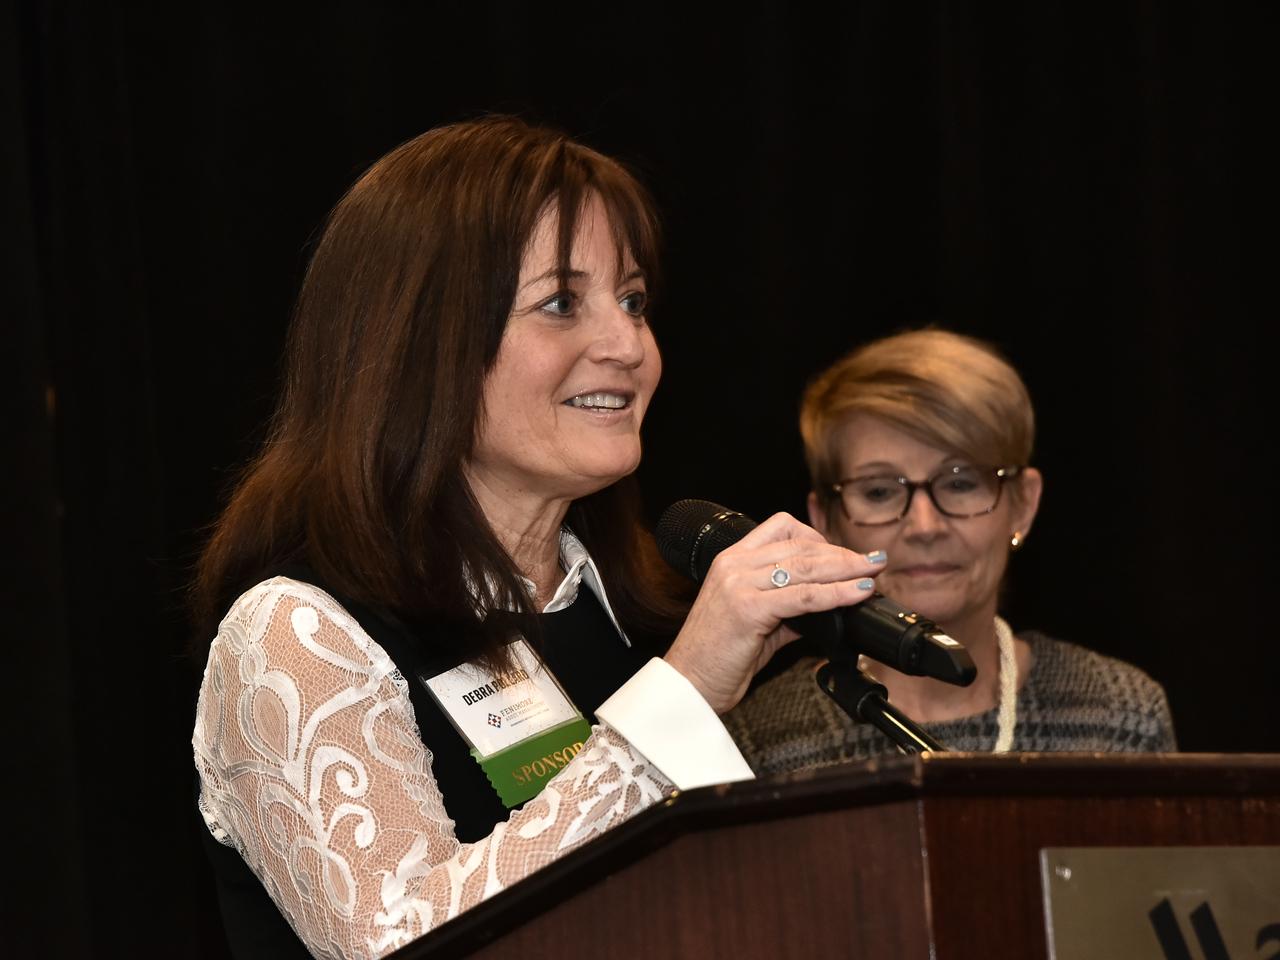 Debra Pollard of Fenimore Asset Management